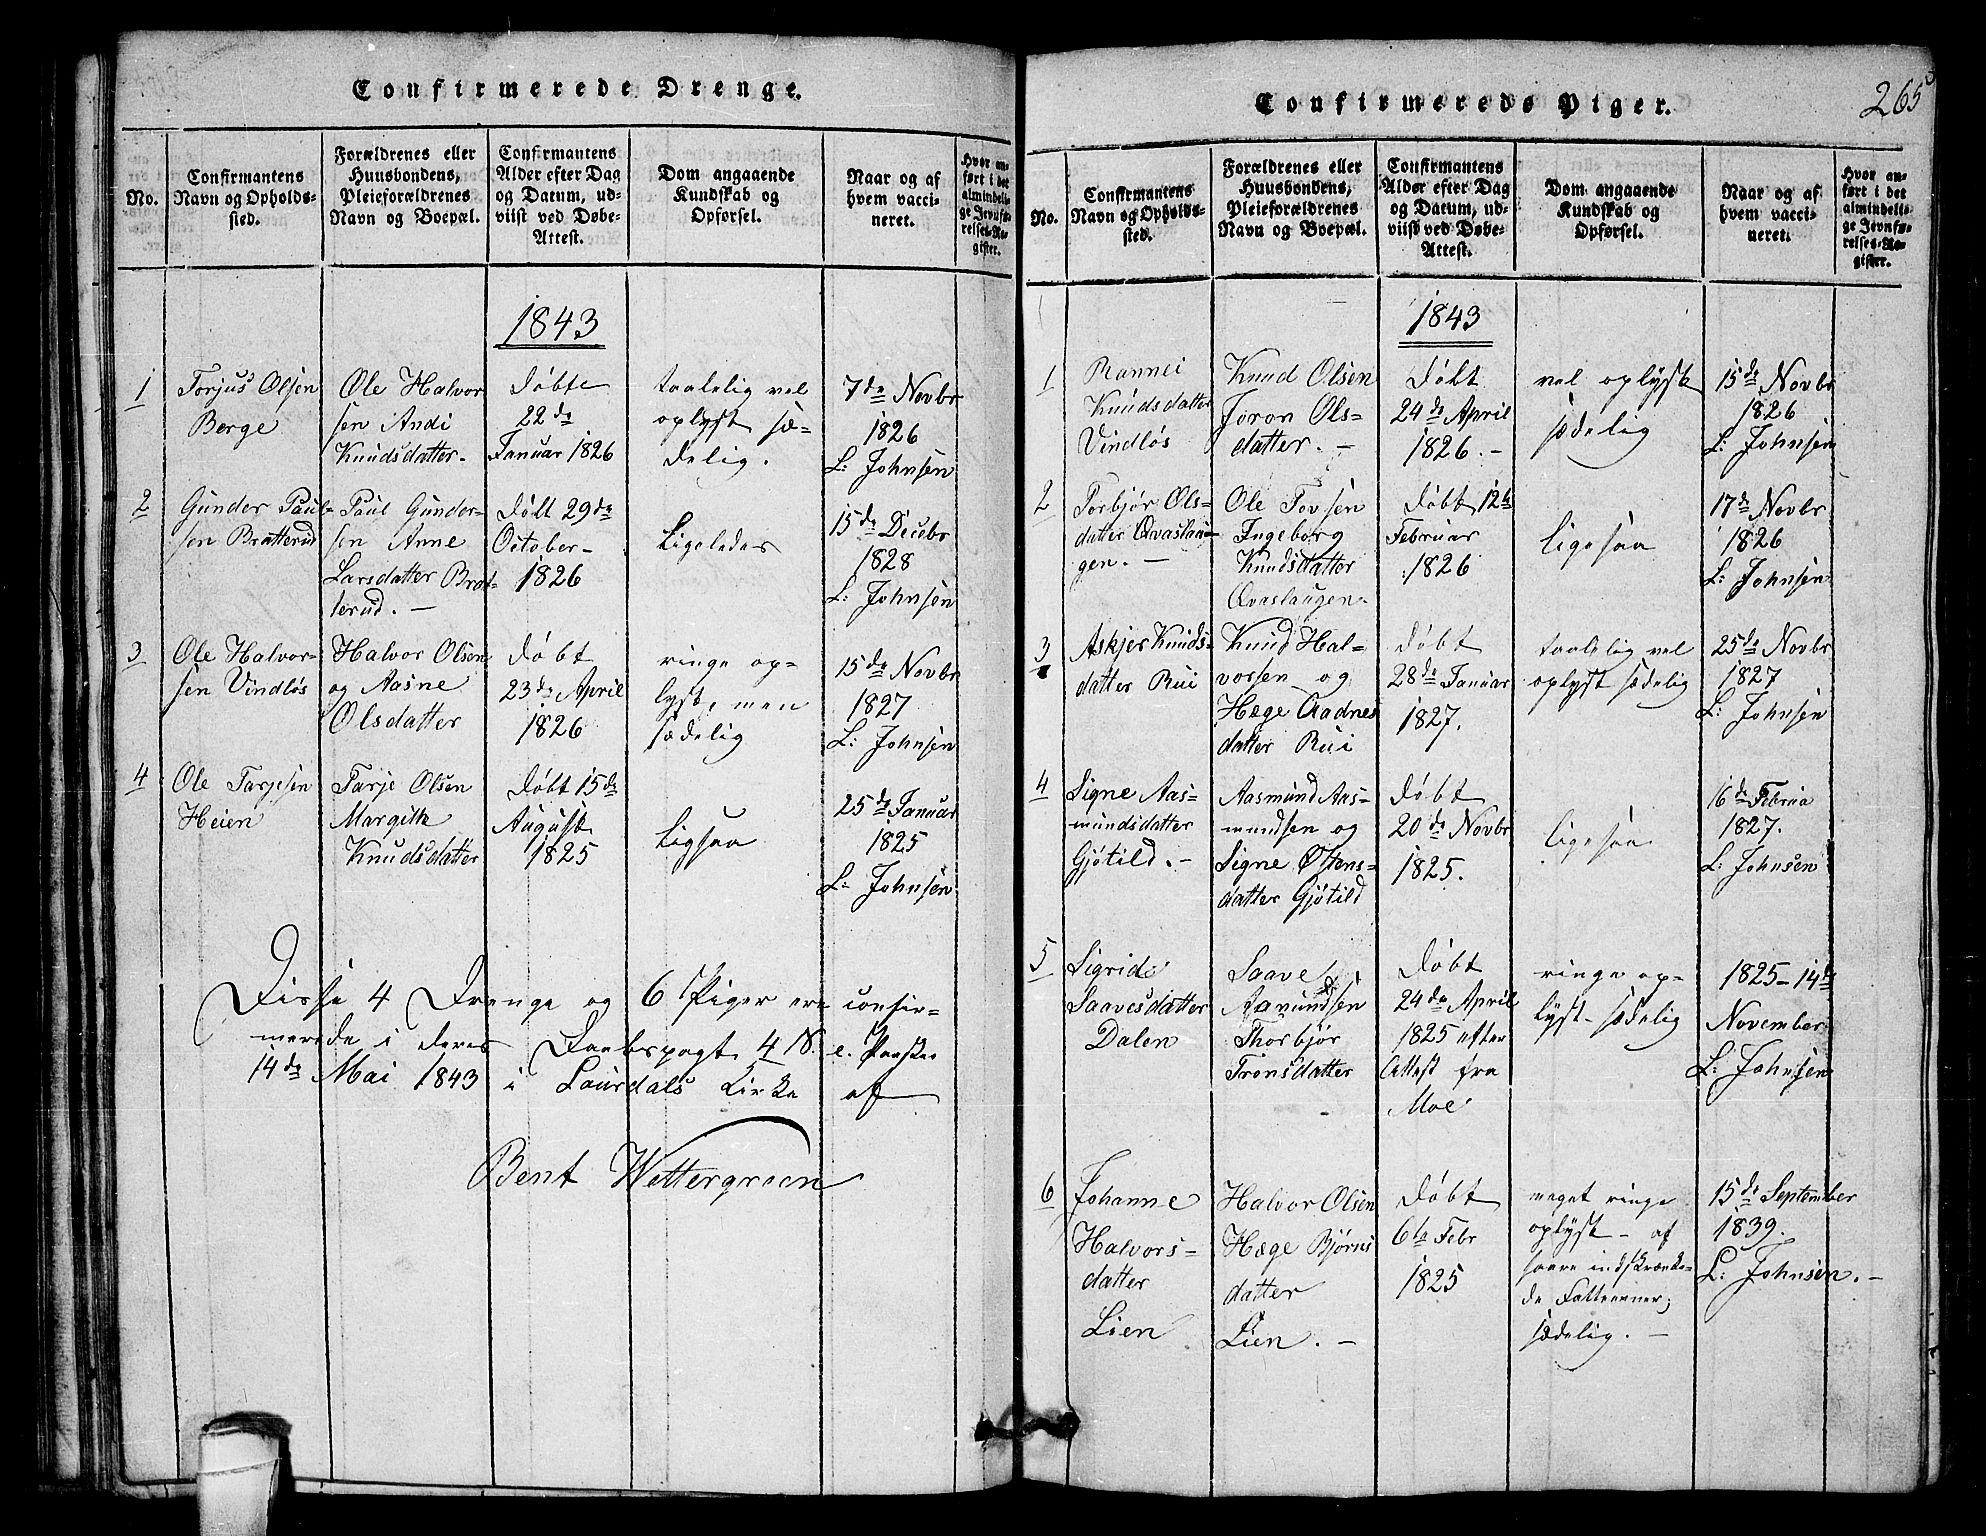 SAKO, Lårdal kirkebøker, G/Gb/L0001: Klokkerbok nr. II 1, 1815-1865, s. 265